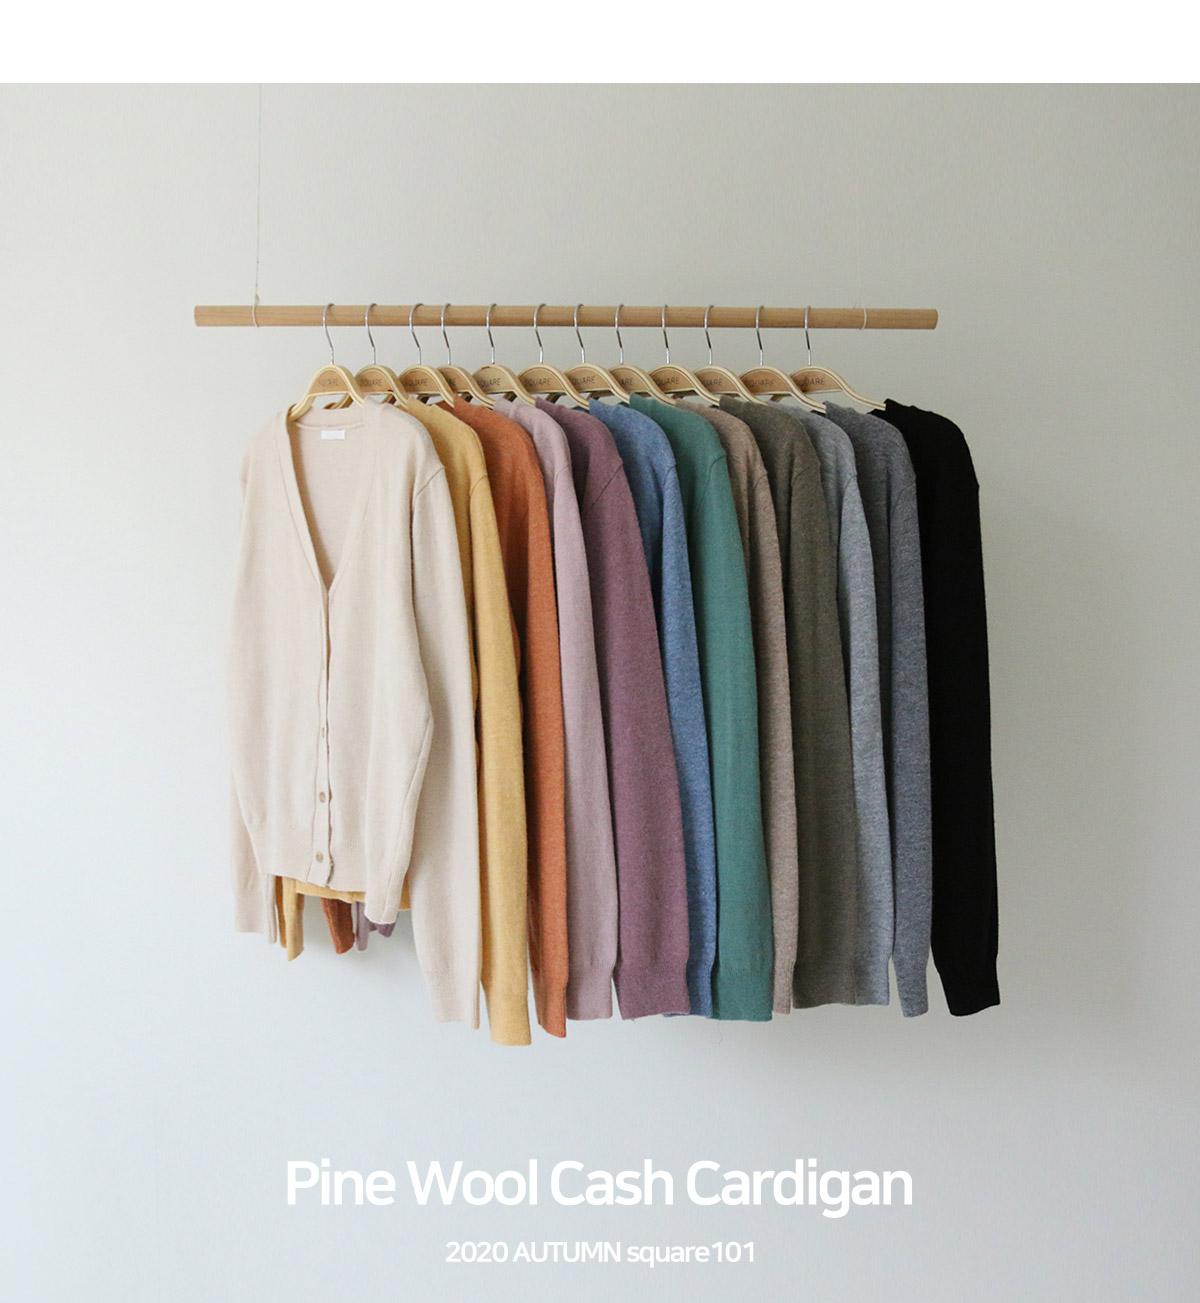 Pine Wool Cash Cardigan